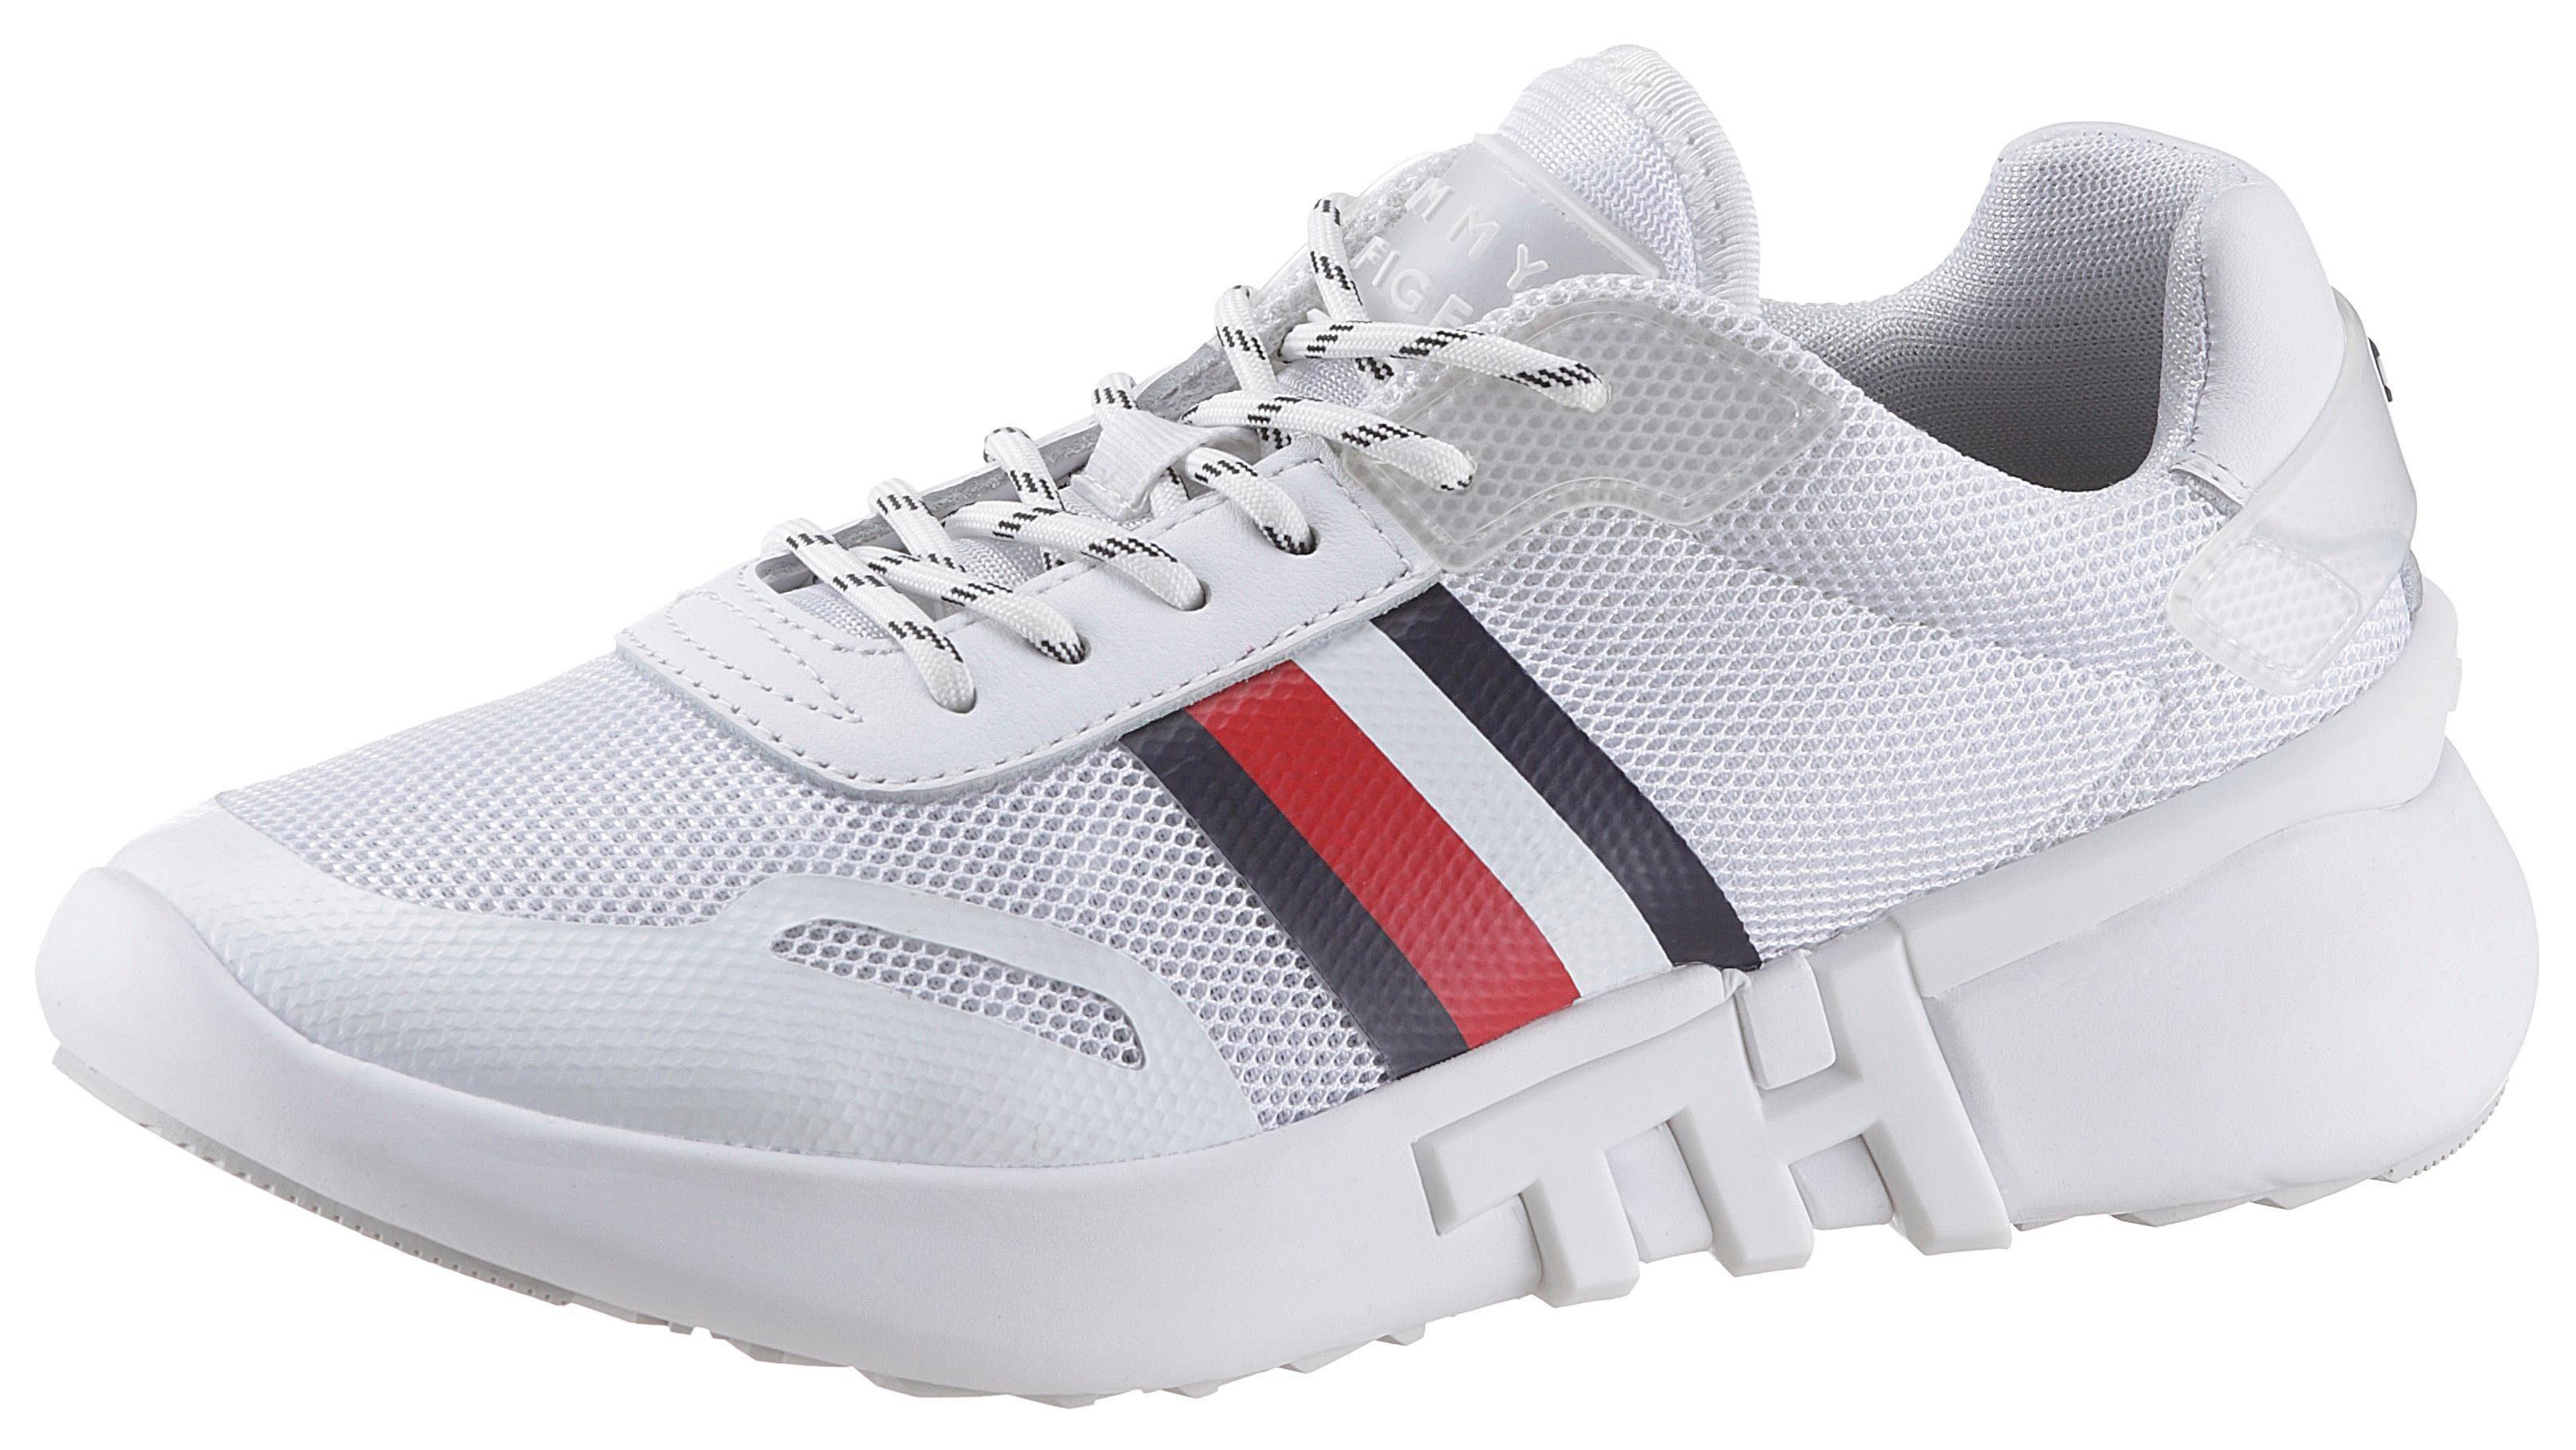 Tommy Hilfiger Sneakers Met Sleehak Sporty Branded Runner Nu Online Bestellen - Geweldige Prijs